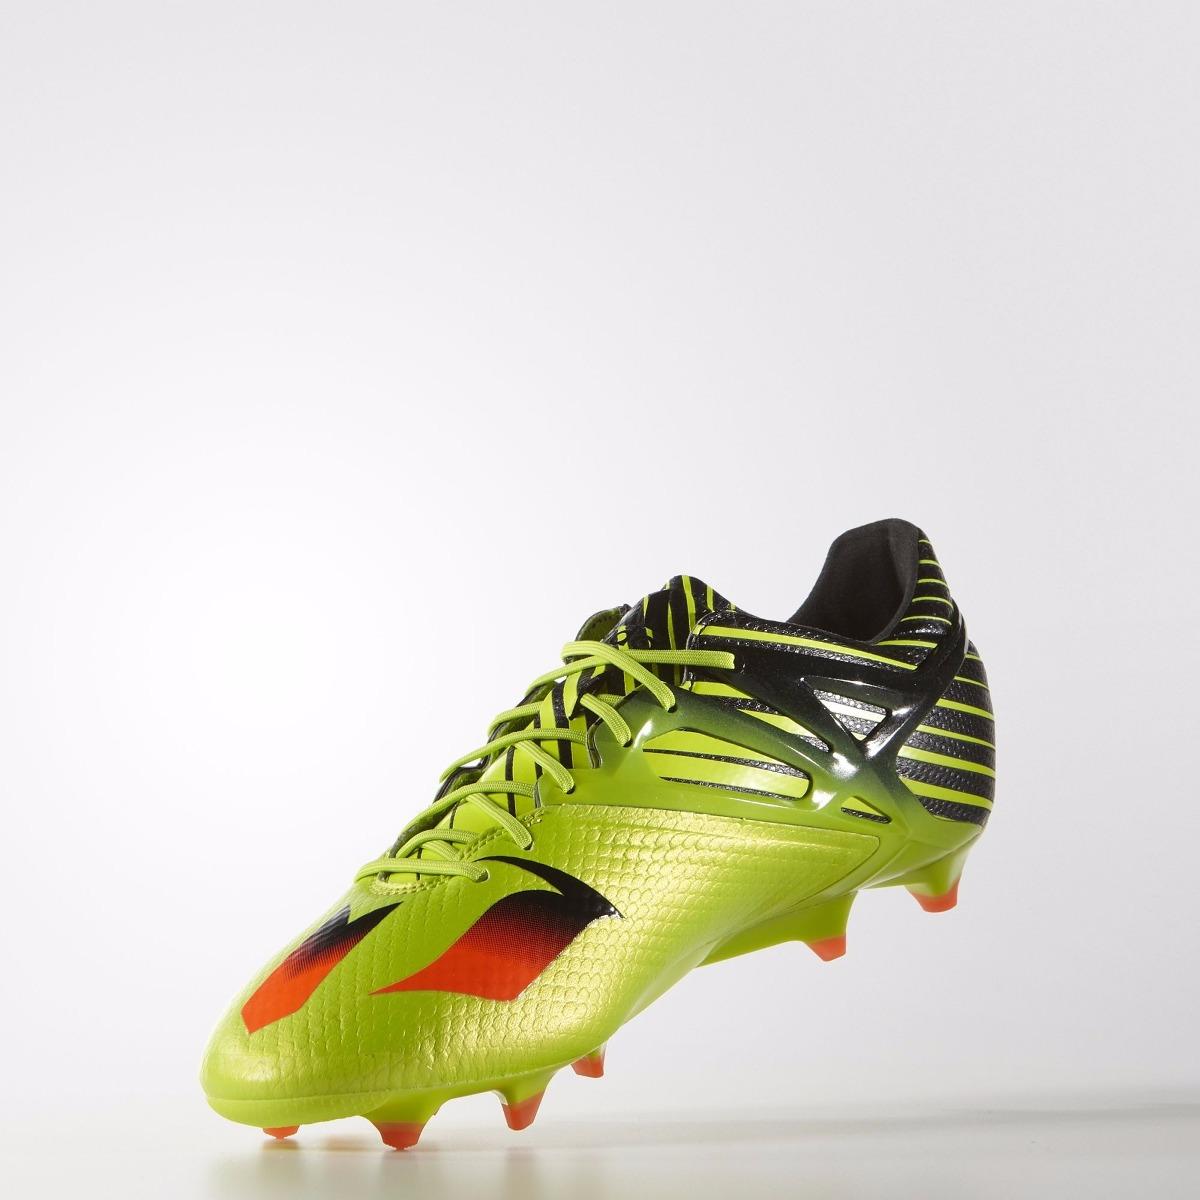 Zapatos Profesionales Messi 1 Soccer 15 Adidas Futbol S74679 j5A4RL